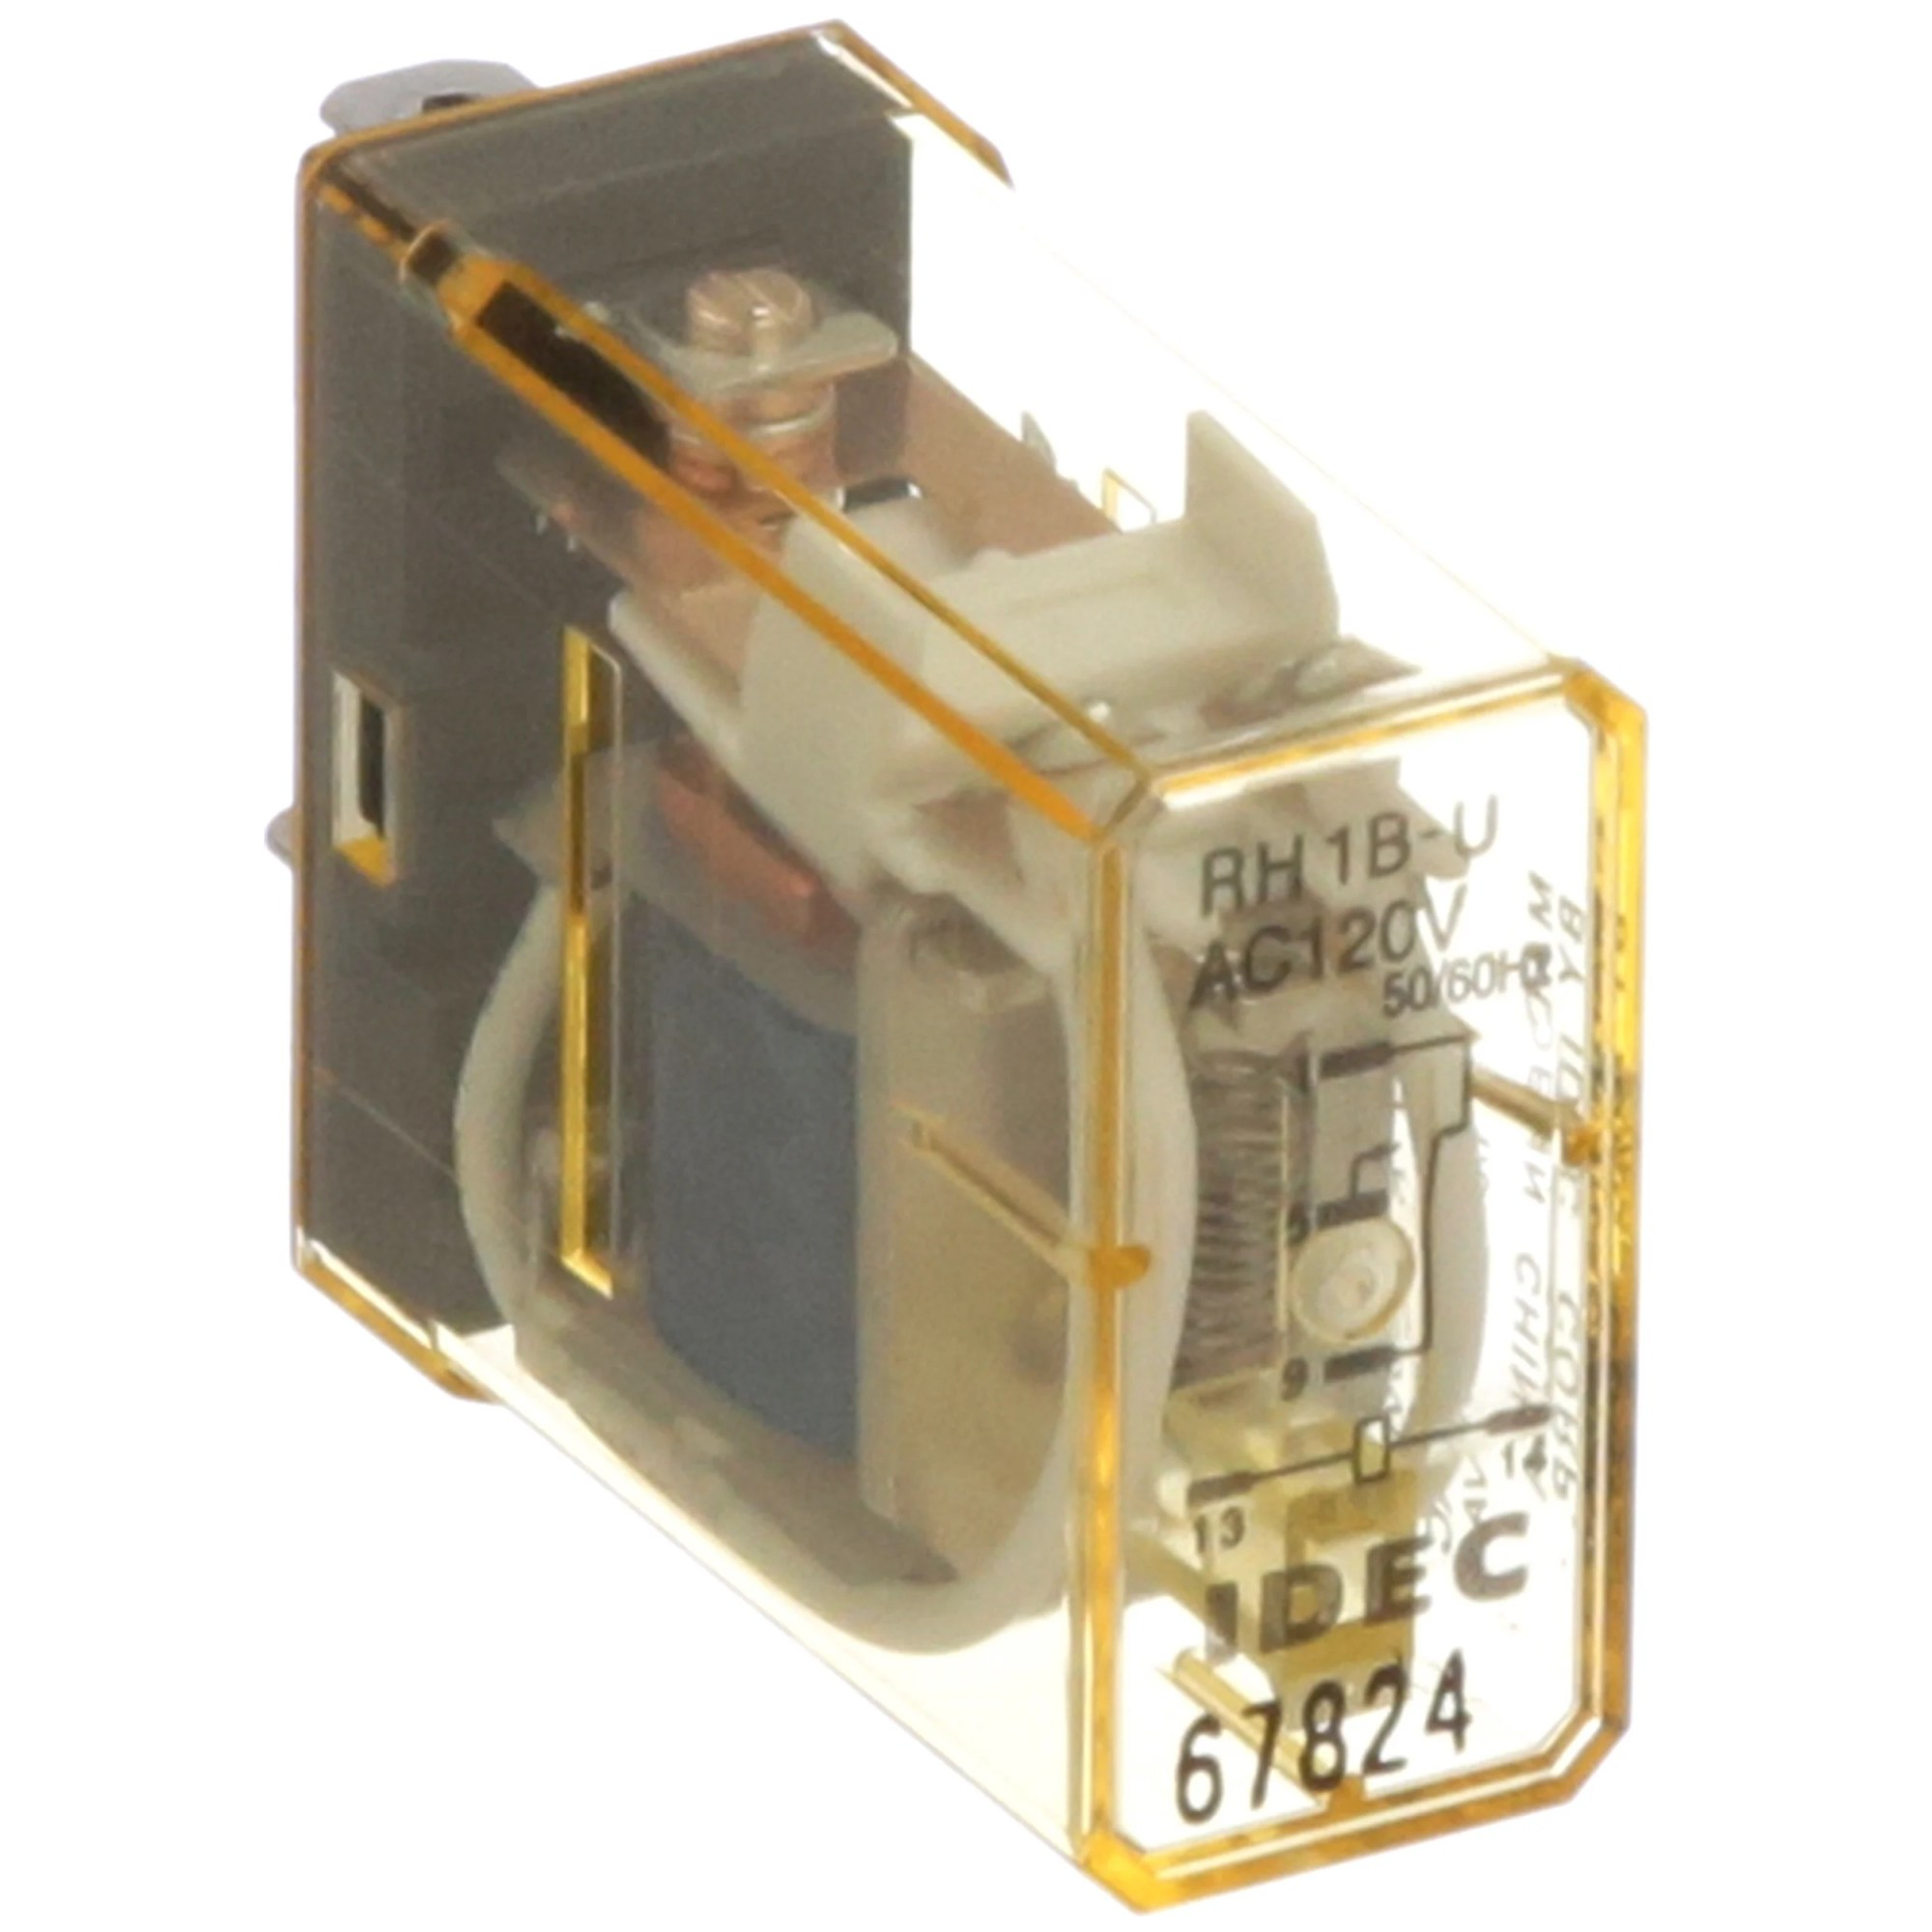 hight resolution of idec corporation rh1b uac120v relay e mech gen purp spdt cur rtg 10a ctrl v 110 120ac vol rtg 240 30ac dc allied electronics automation